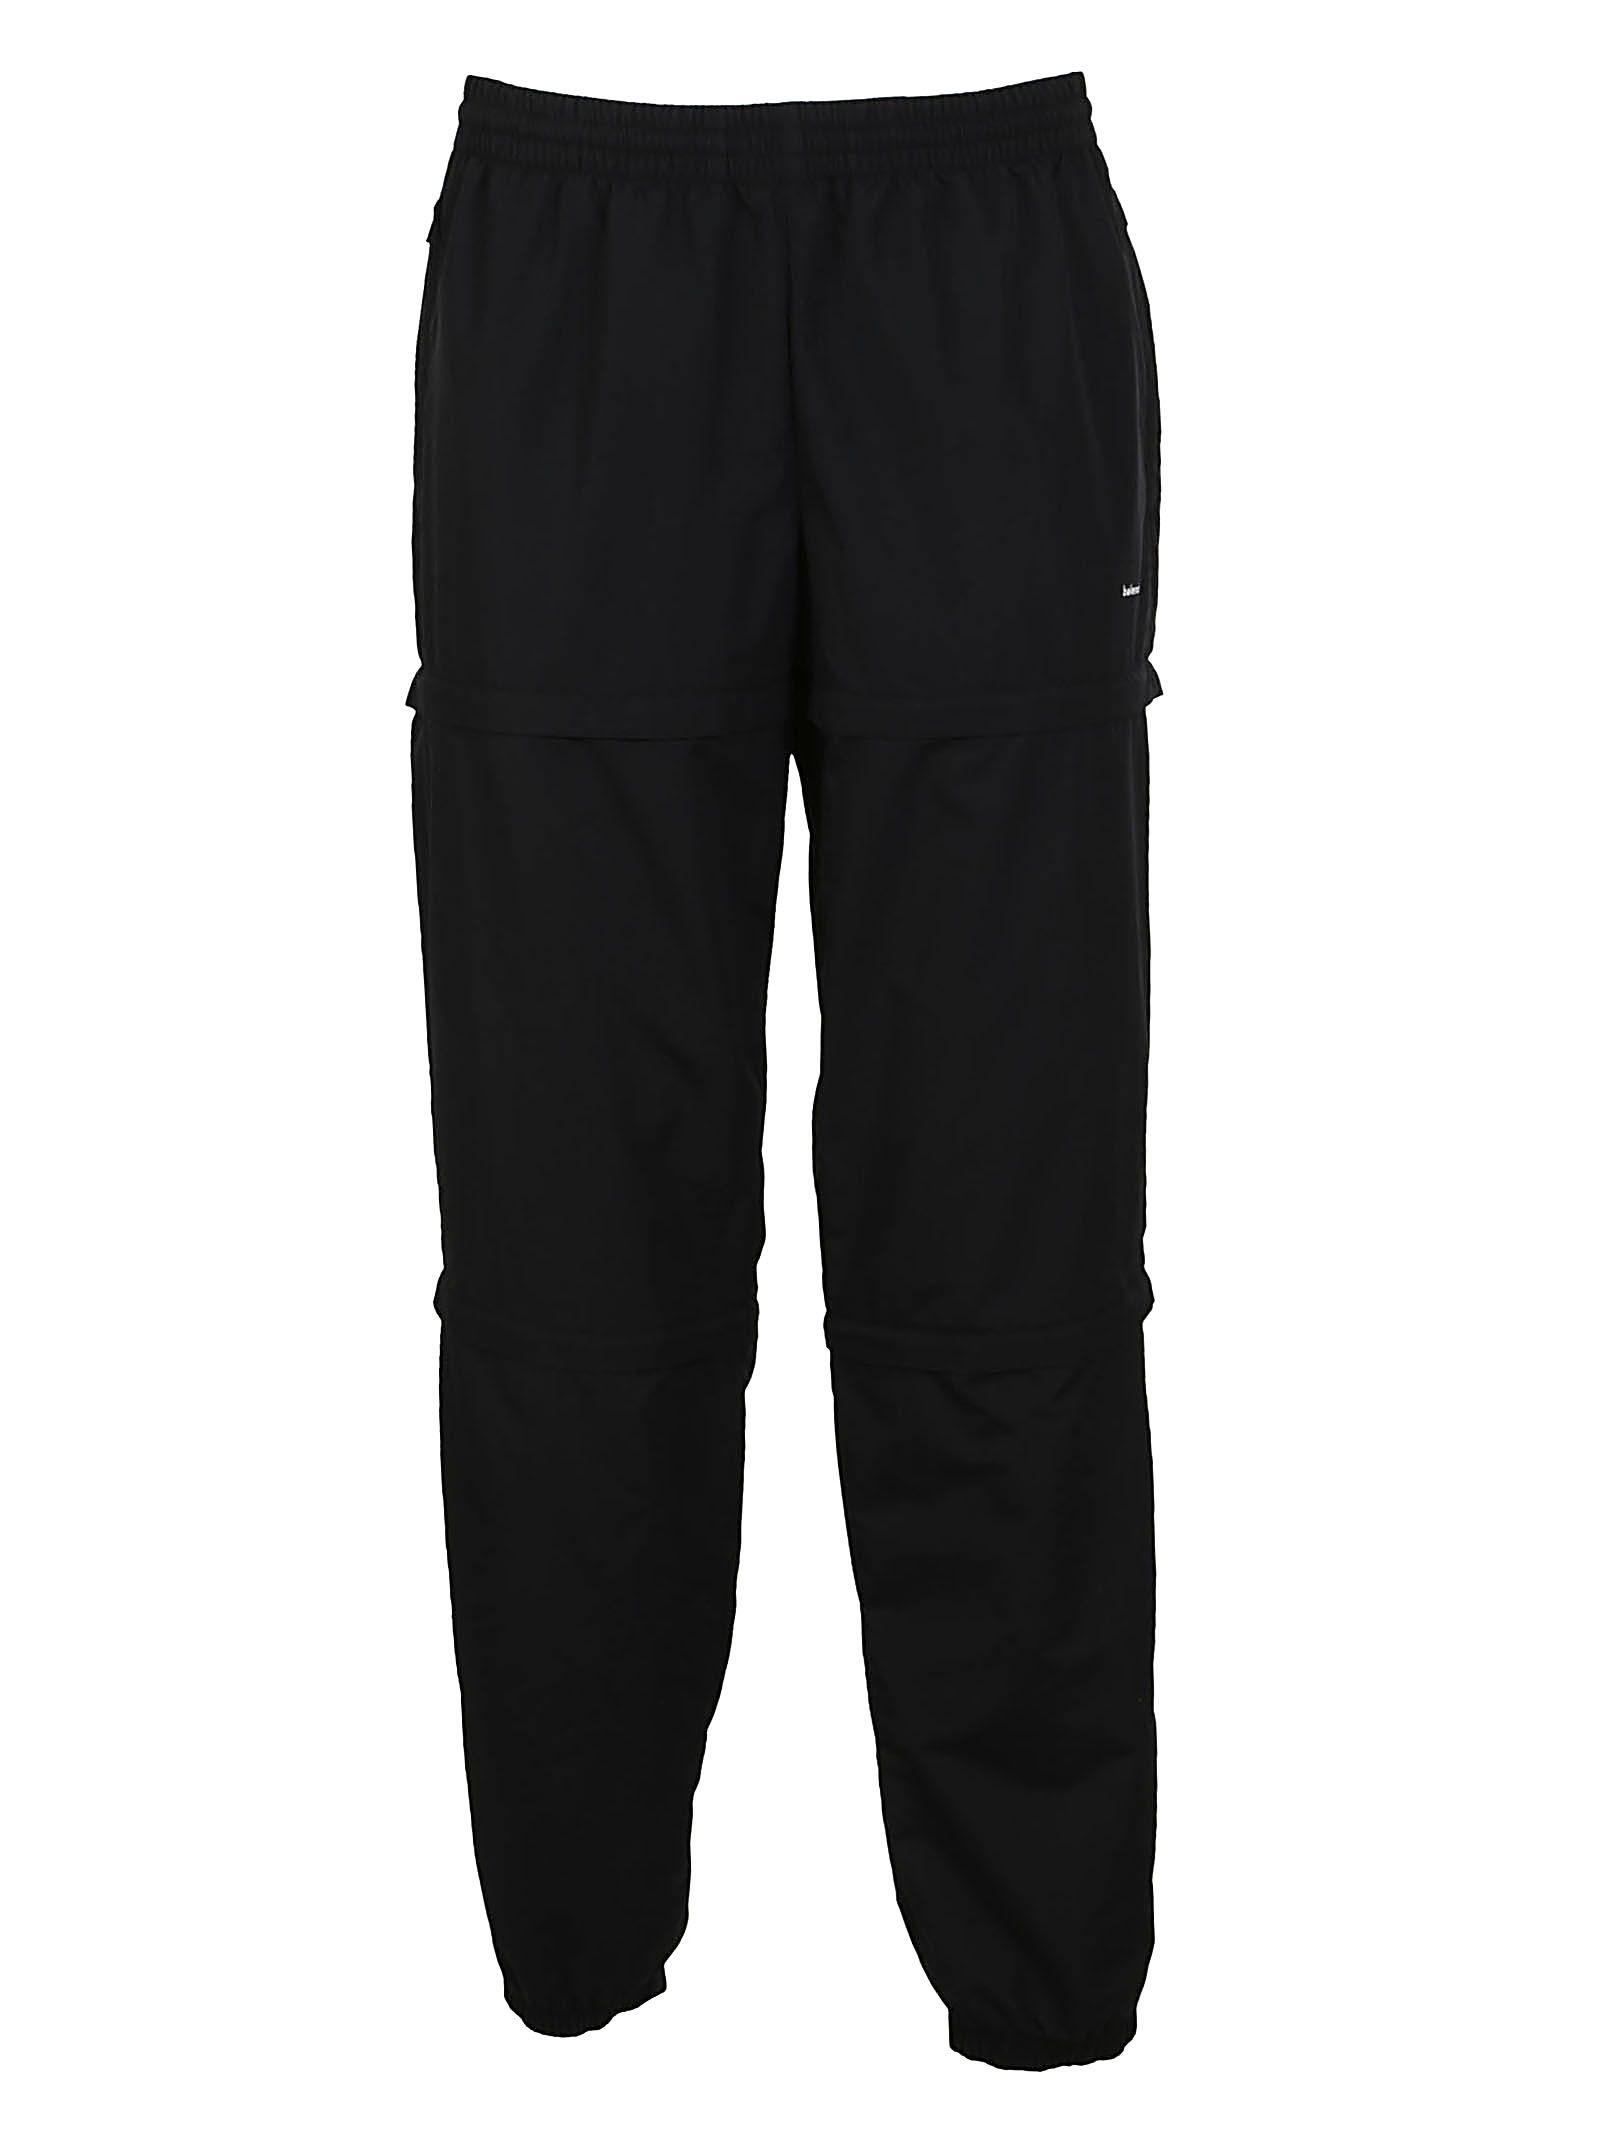 9fdeb6b9888c Balenciaga Elasticated-Waist Detachable-Panel Trousers In Black